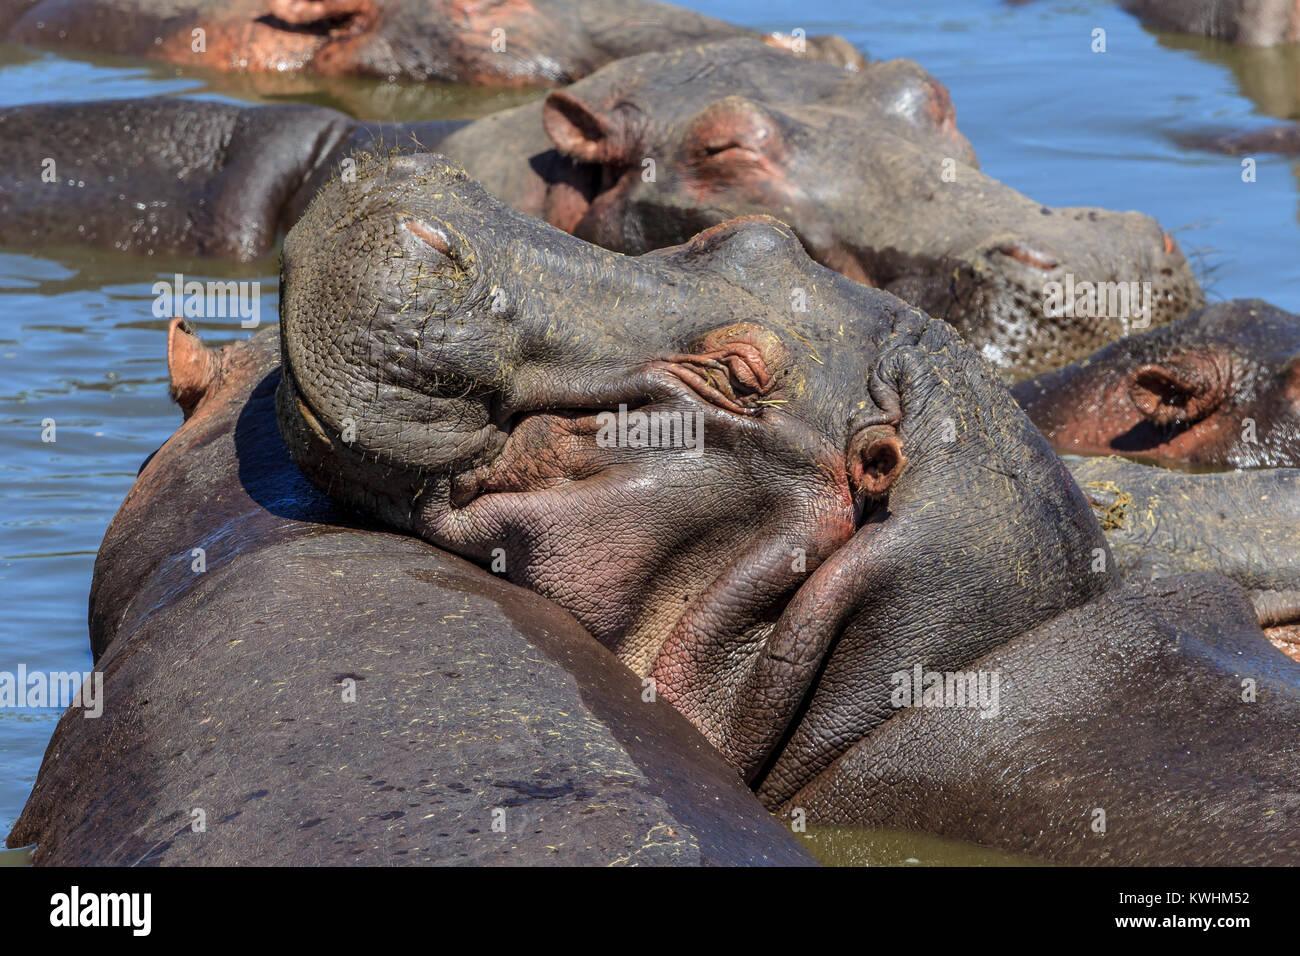 L'hippopotame commun, ou de l'hippopotame, est un grand mammifère herbivore semi-aquatiques, principalement Photo Stock